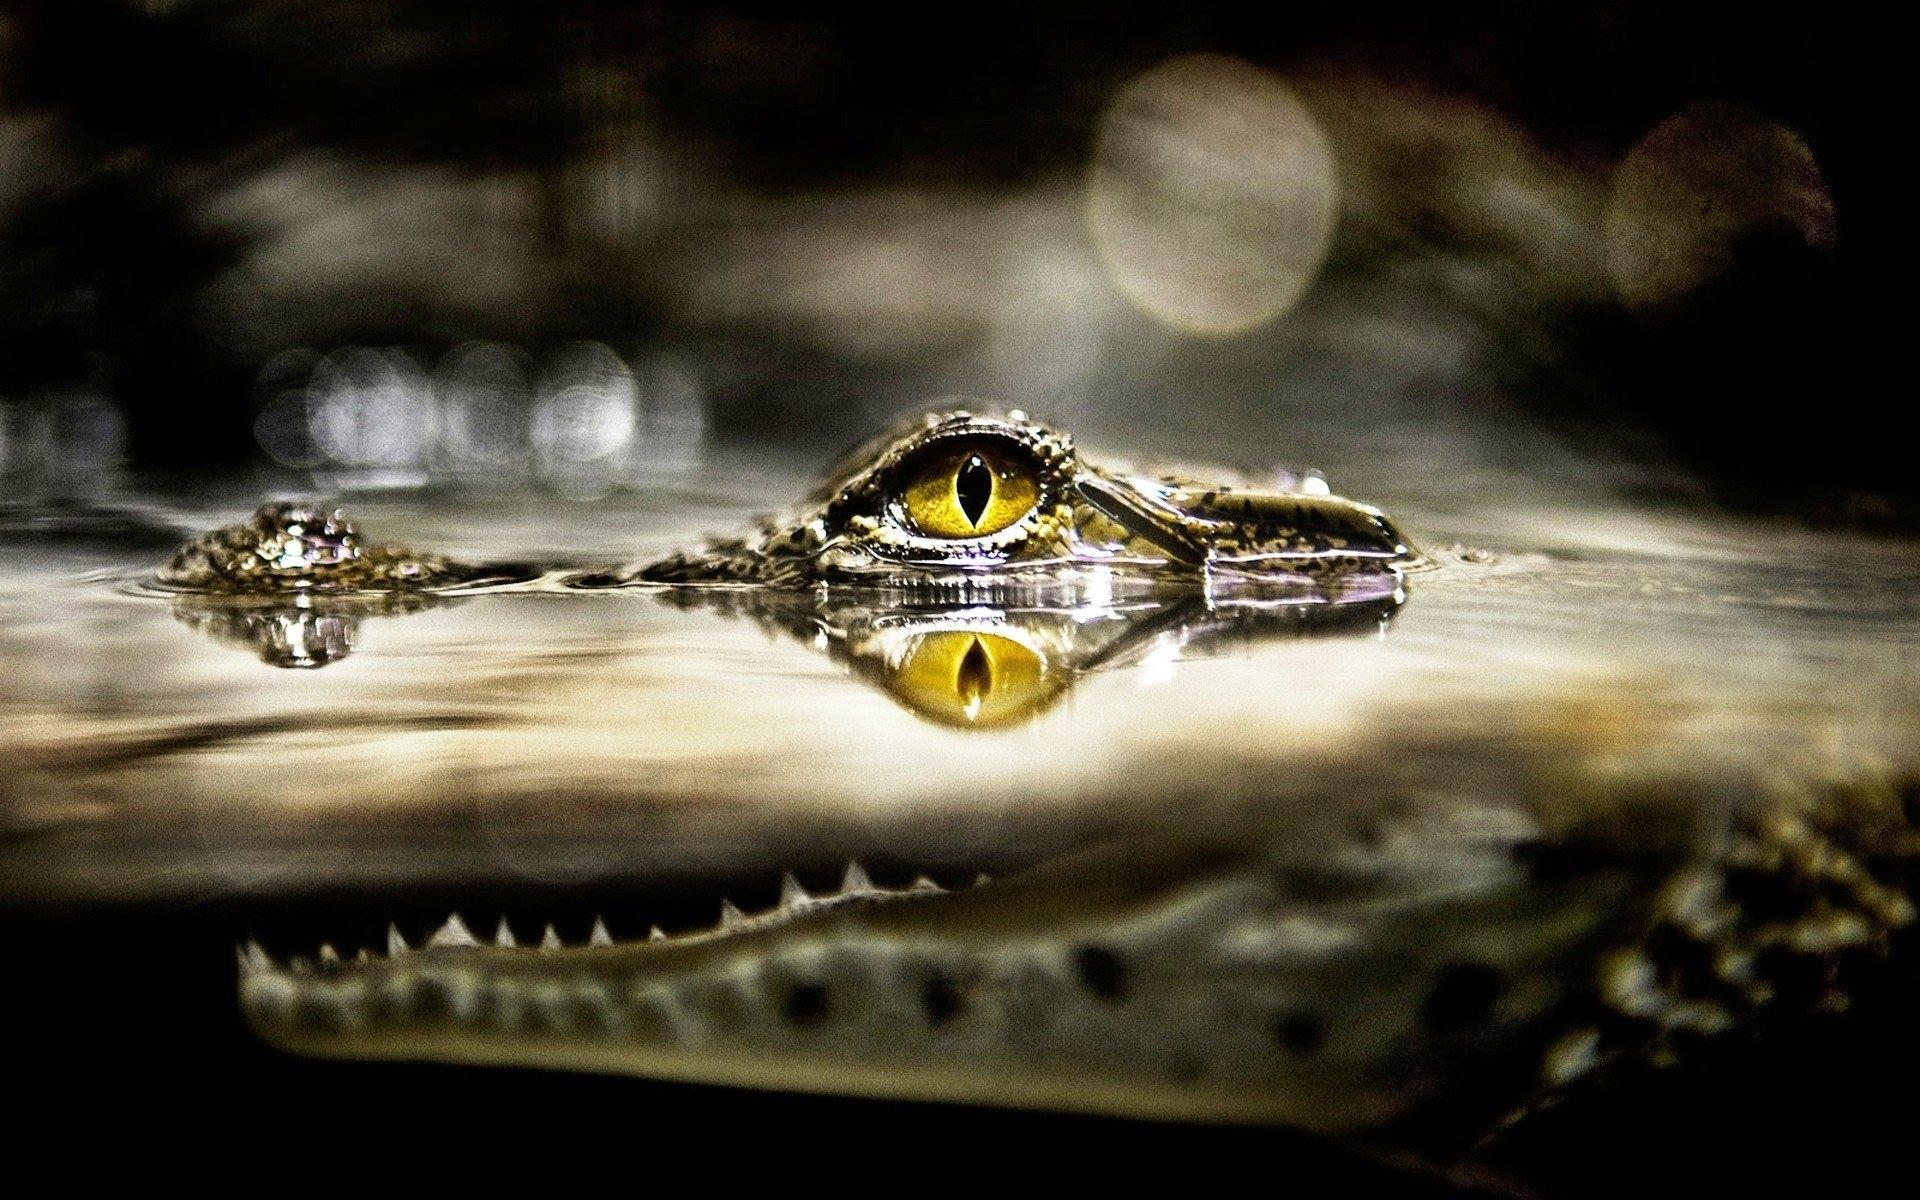 crocodile new wallpapers